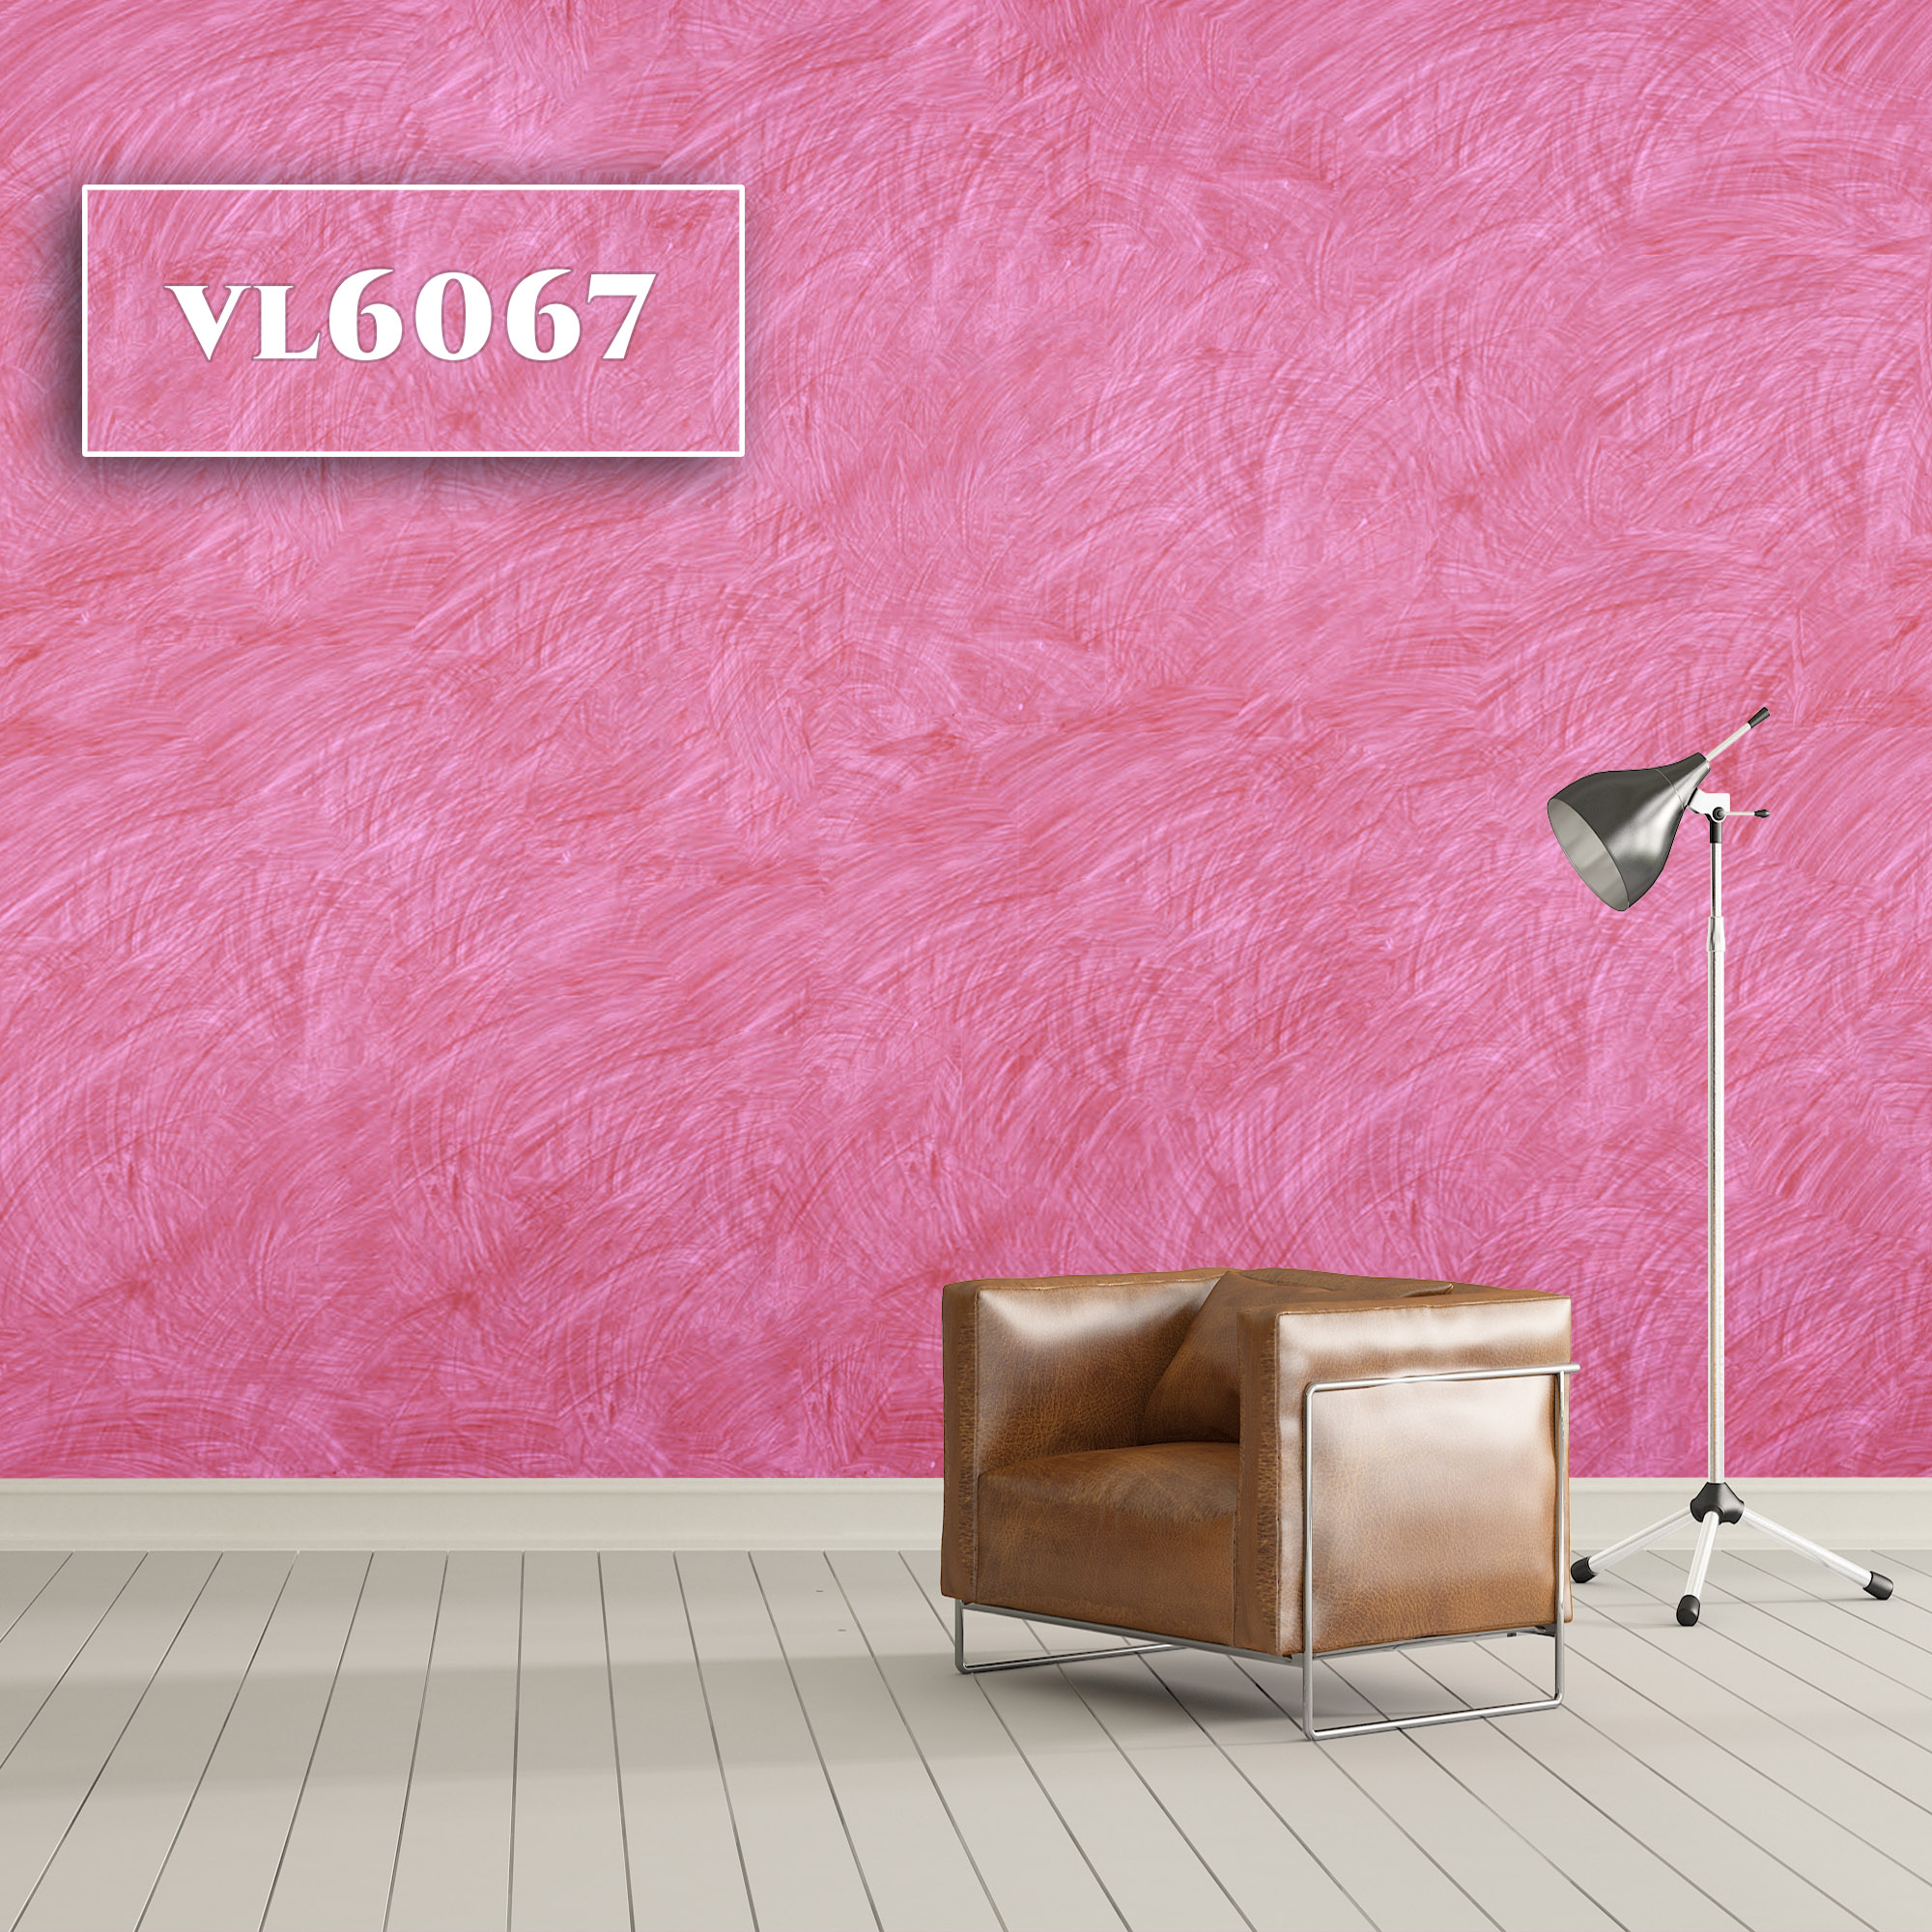 VL6067